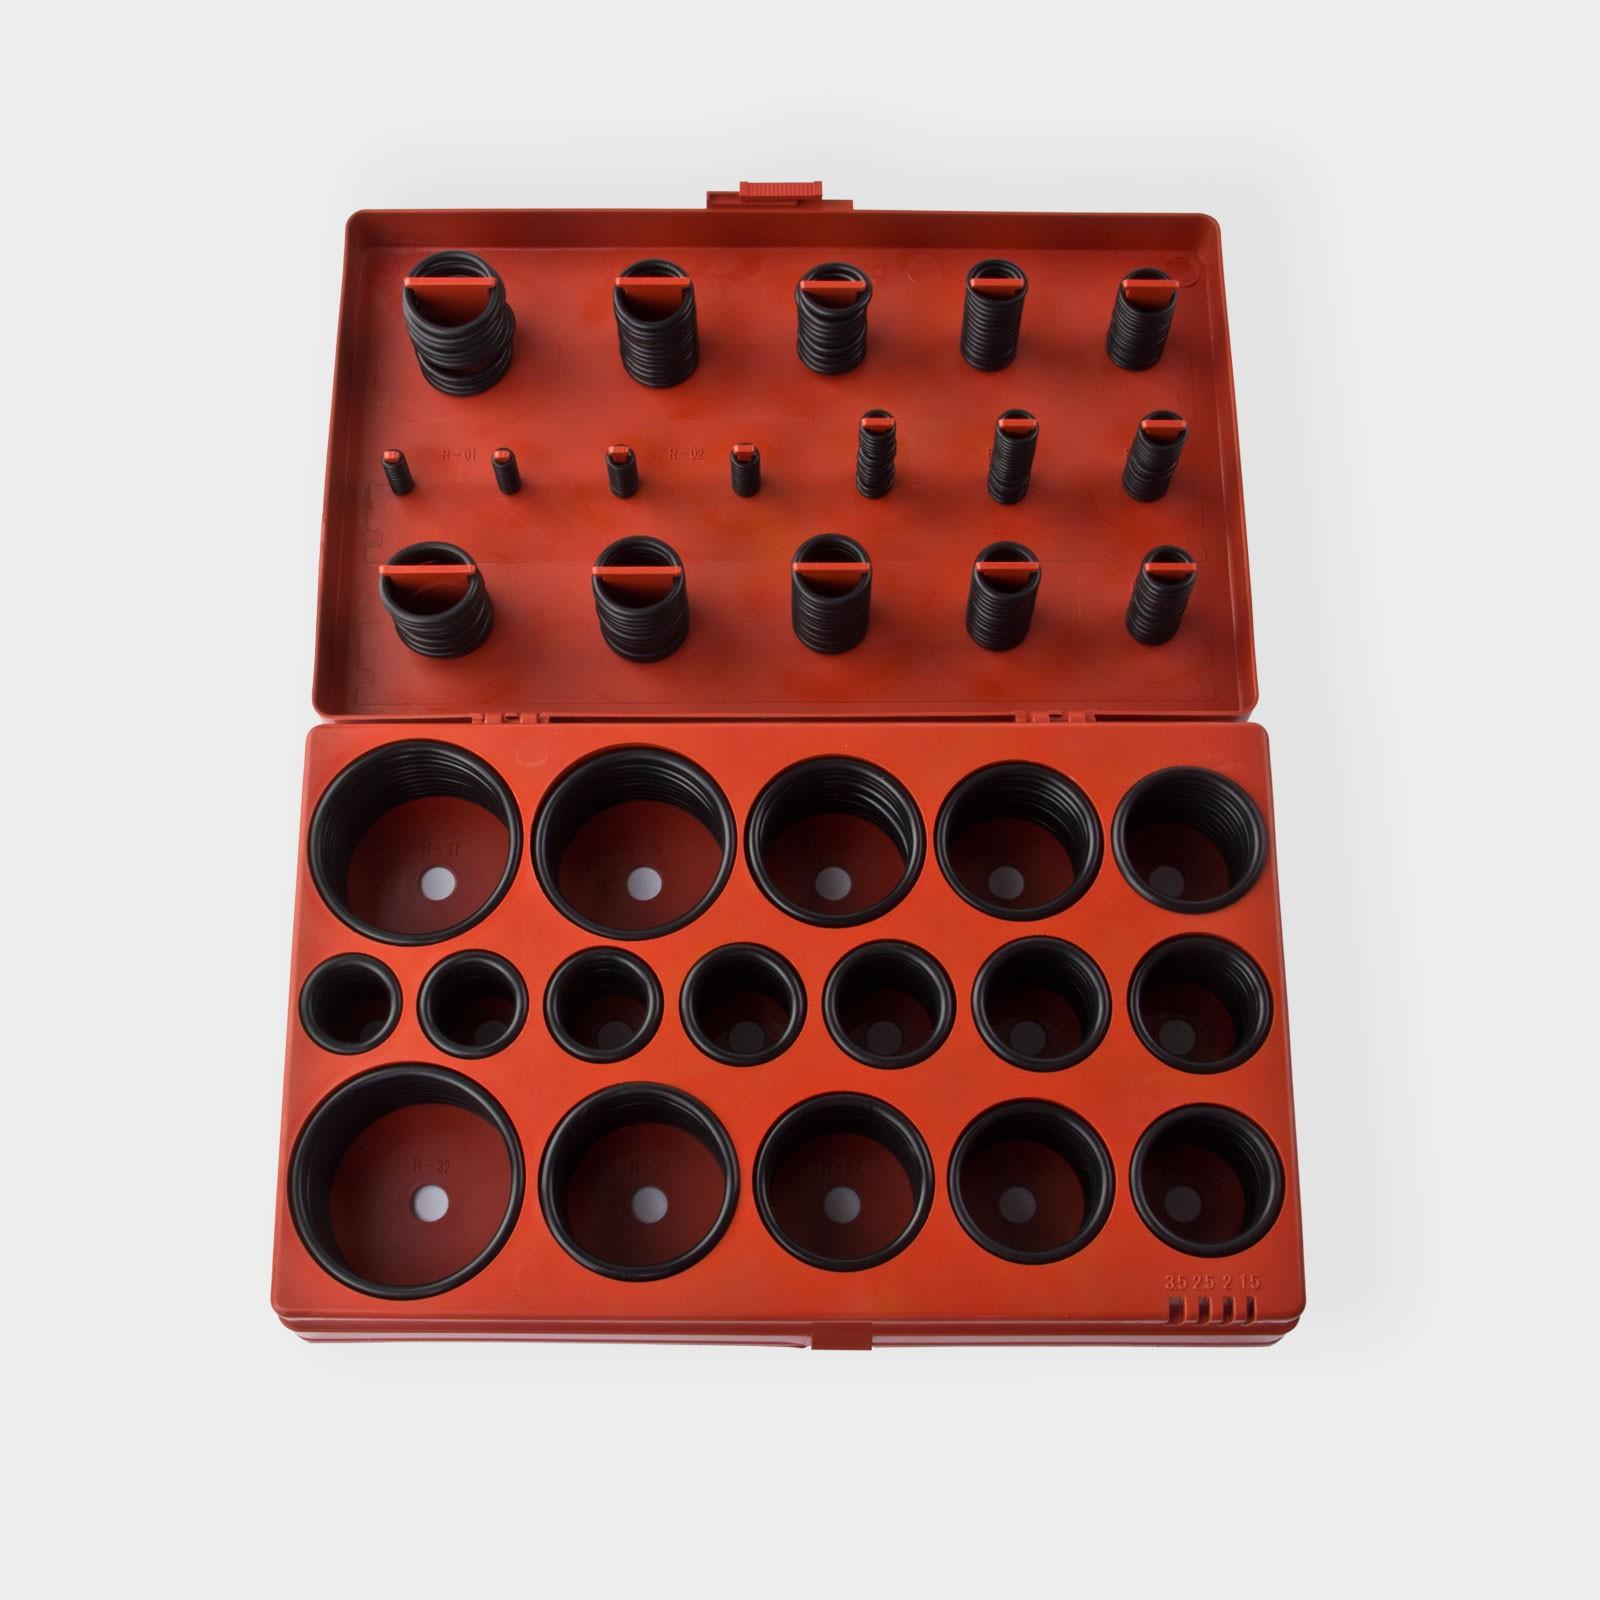 sanit r wasser o ring dichtungssortiment sortimentskasten dichtung dichtungen ebay. Black Bedroom Furniture Sets. Home Design Ideas